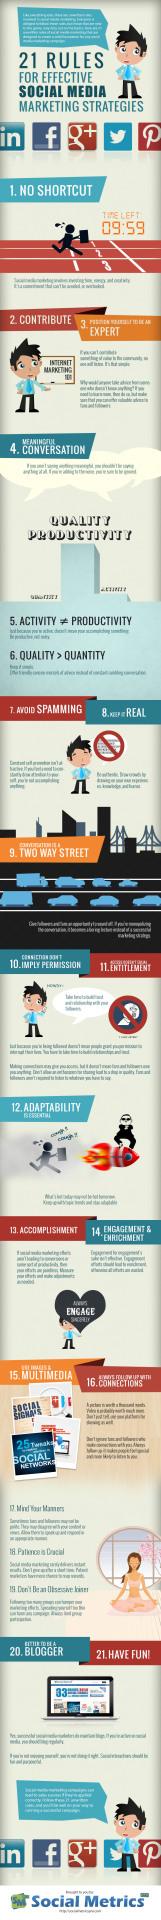 21 Rules For Effective Social Media Mark...